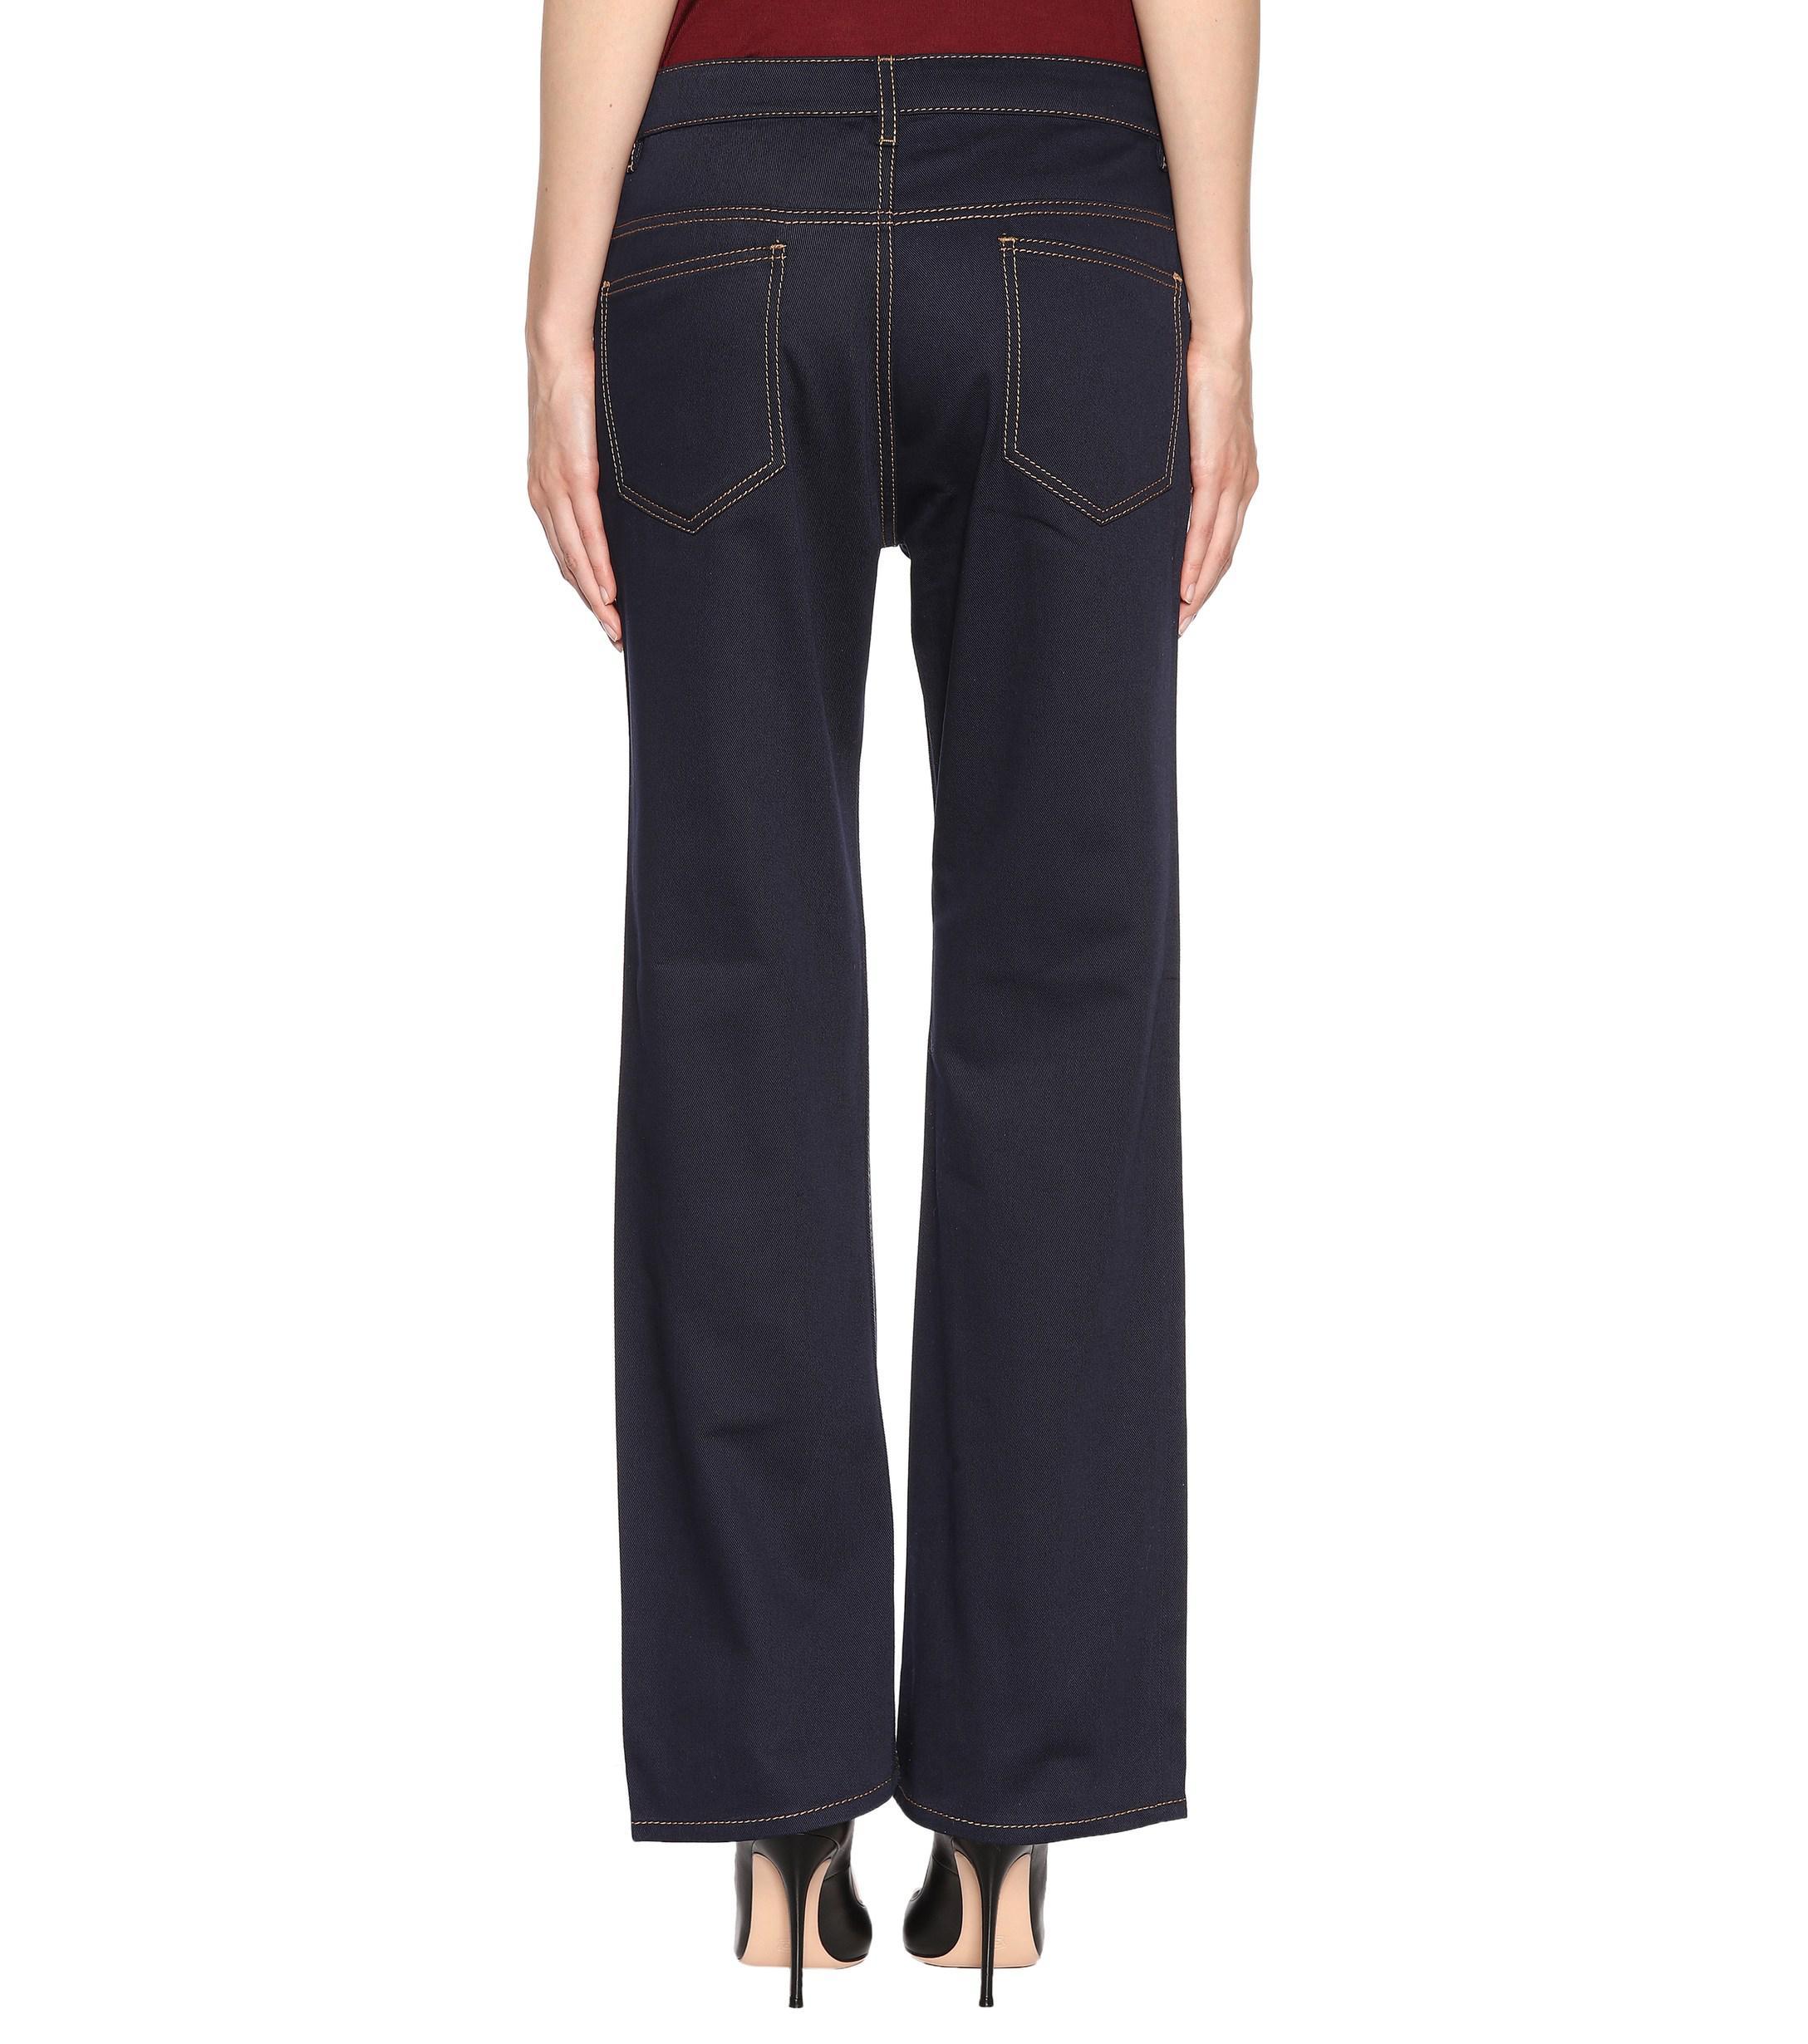 Prada Denim Flared Jeans in Blue